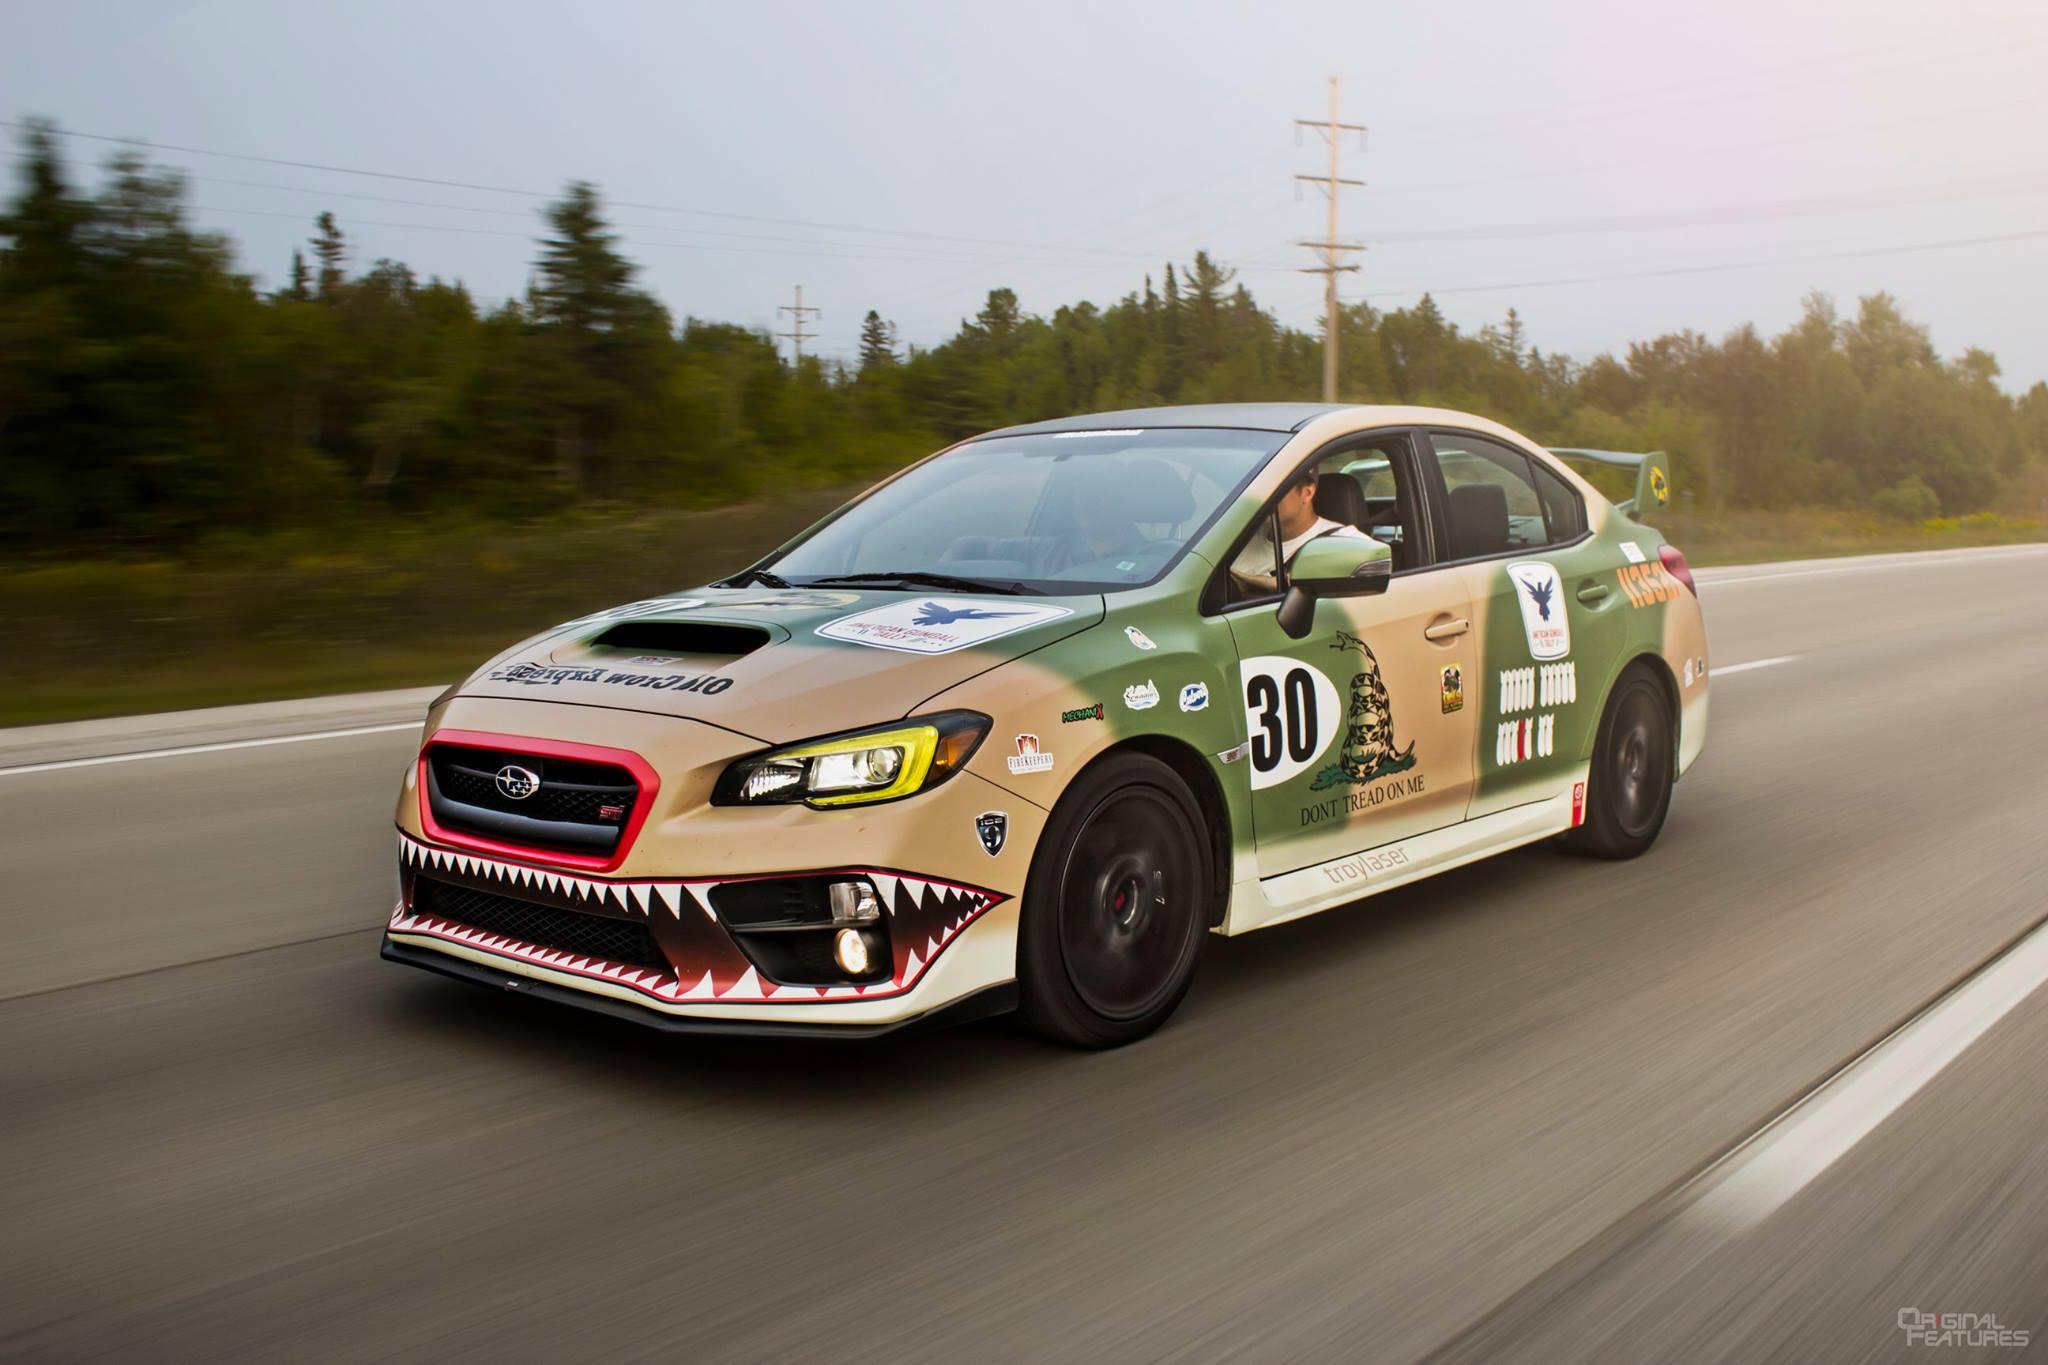 Michigan Gumball Rally Part 2